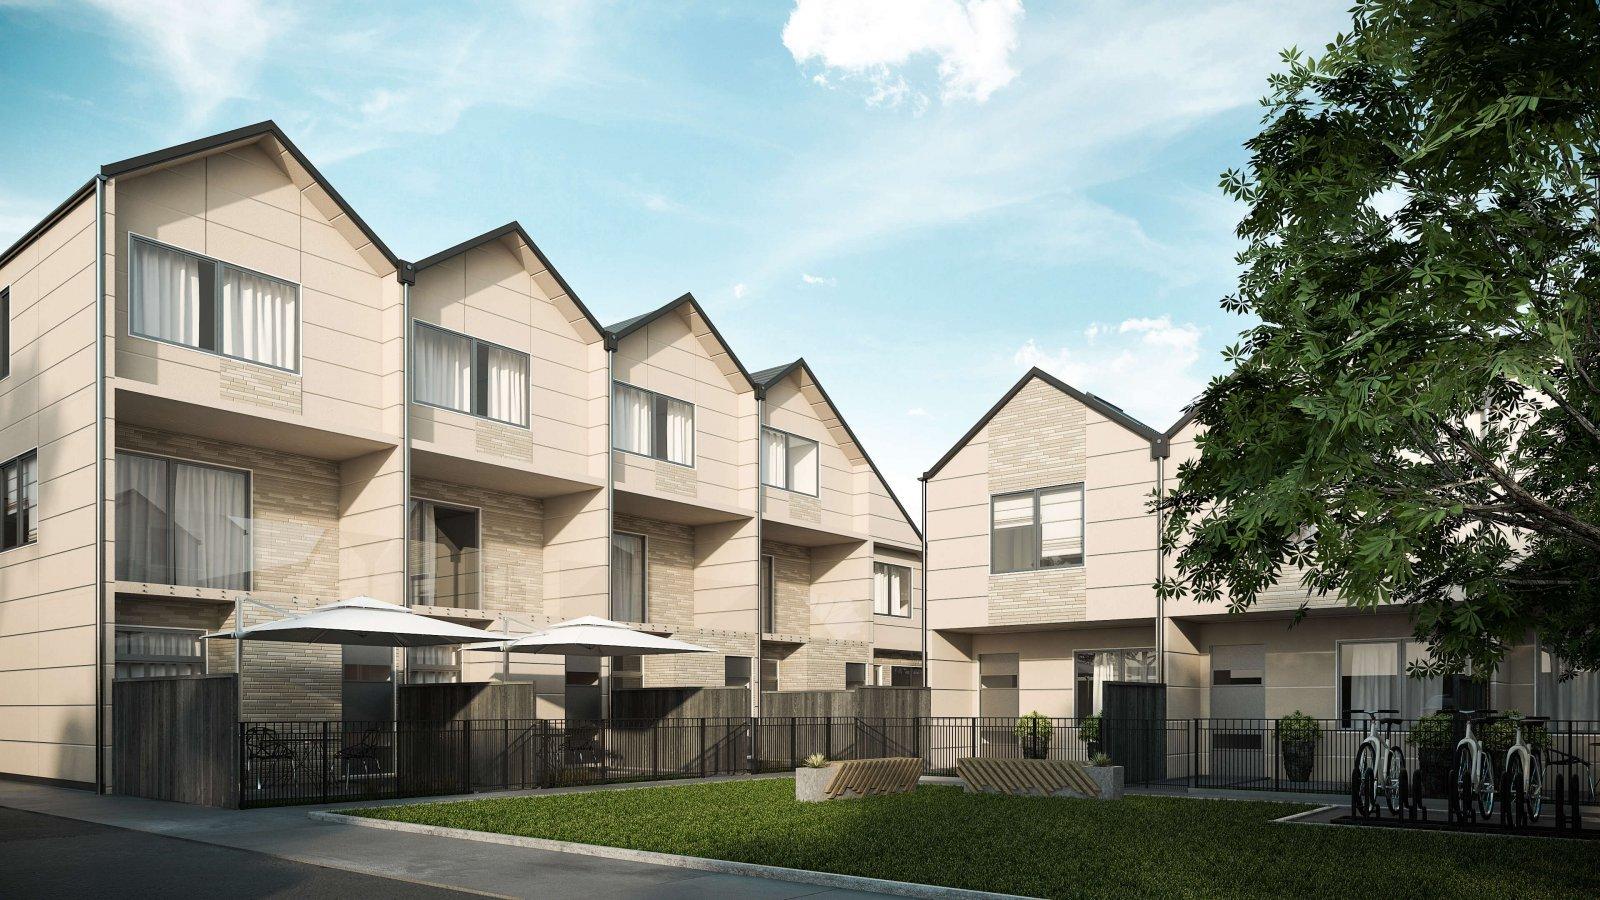 2 Bedroom Townhouse Brand New Tenant Buyers